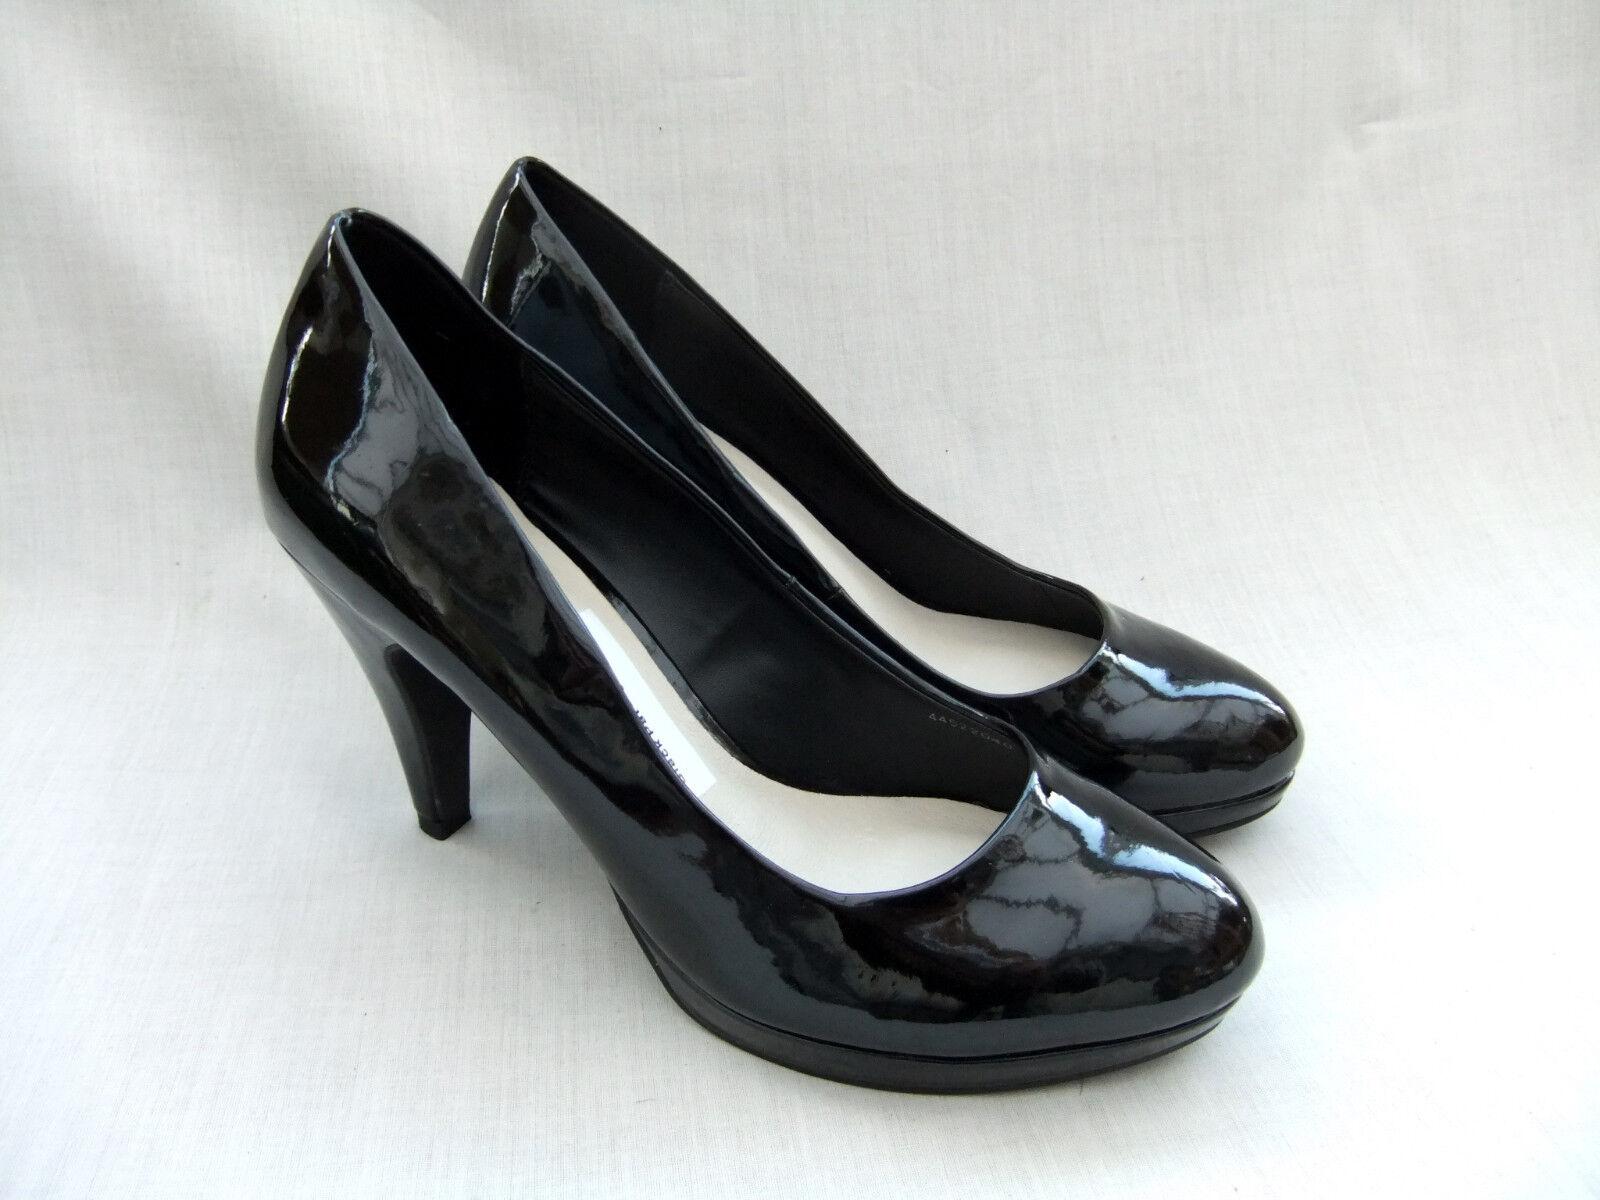 NEW CLARKS ANITA femmes noir PATENT PLATFORM chaussures